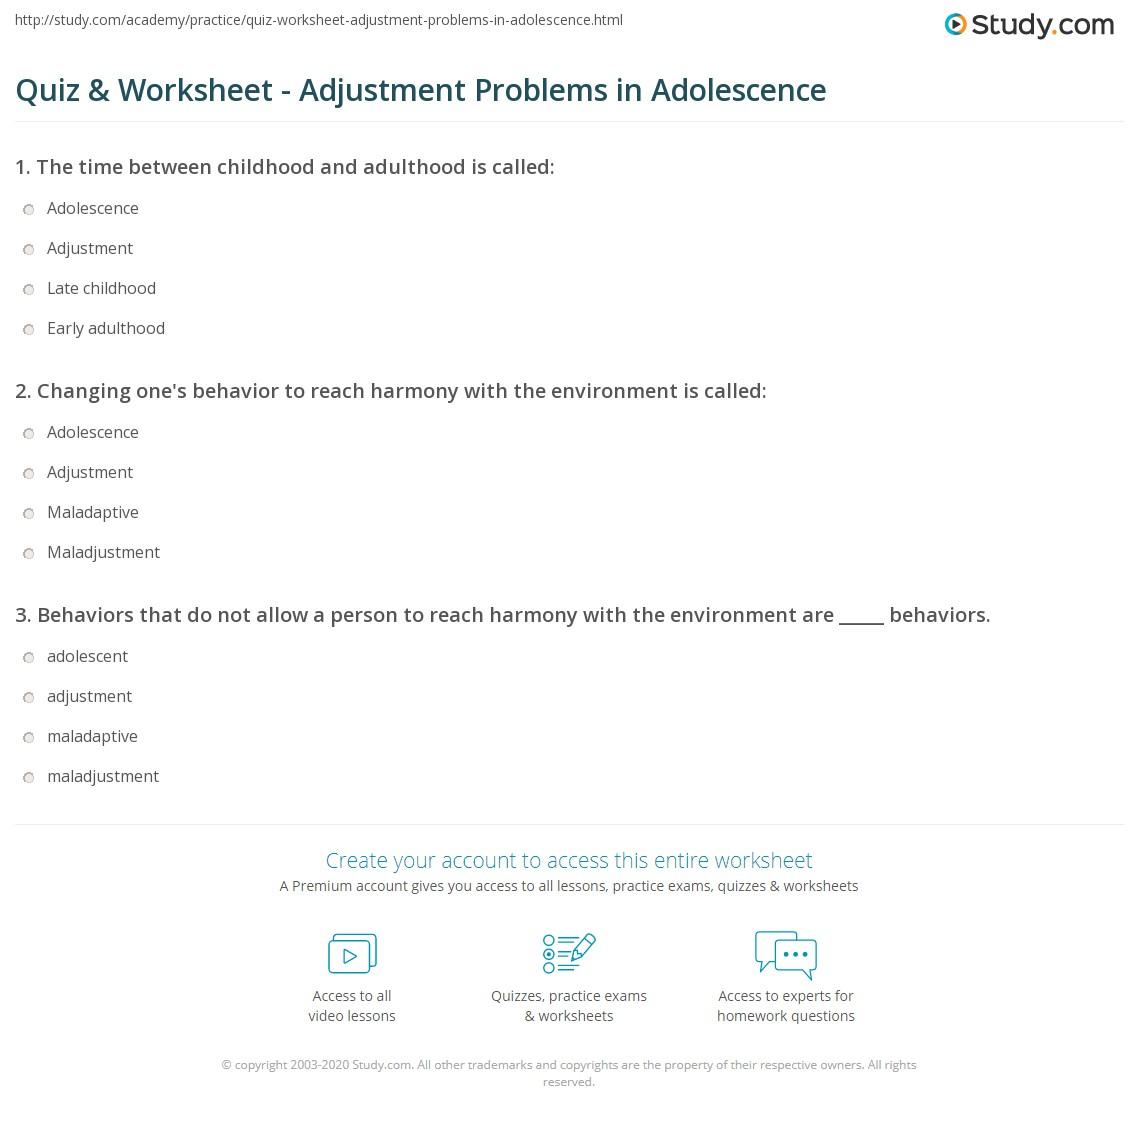 Quiz & Worksheet - Adjustment Problems in Adolescence   Study com